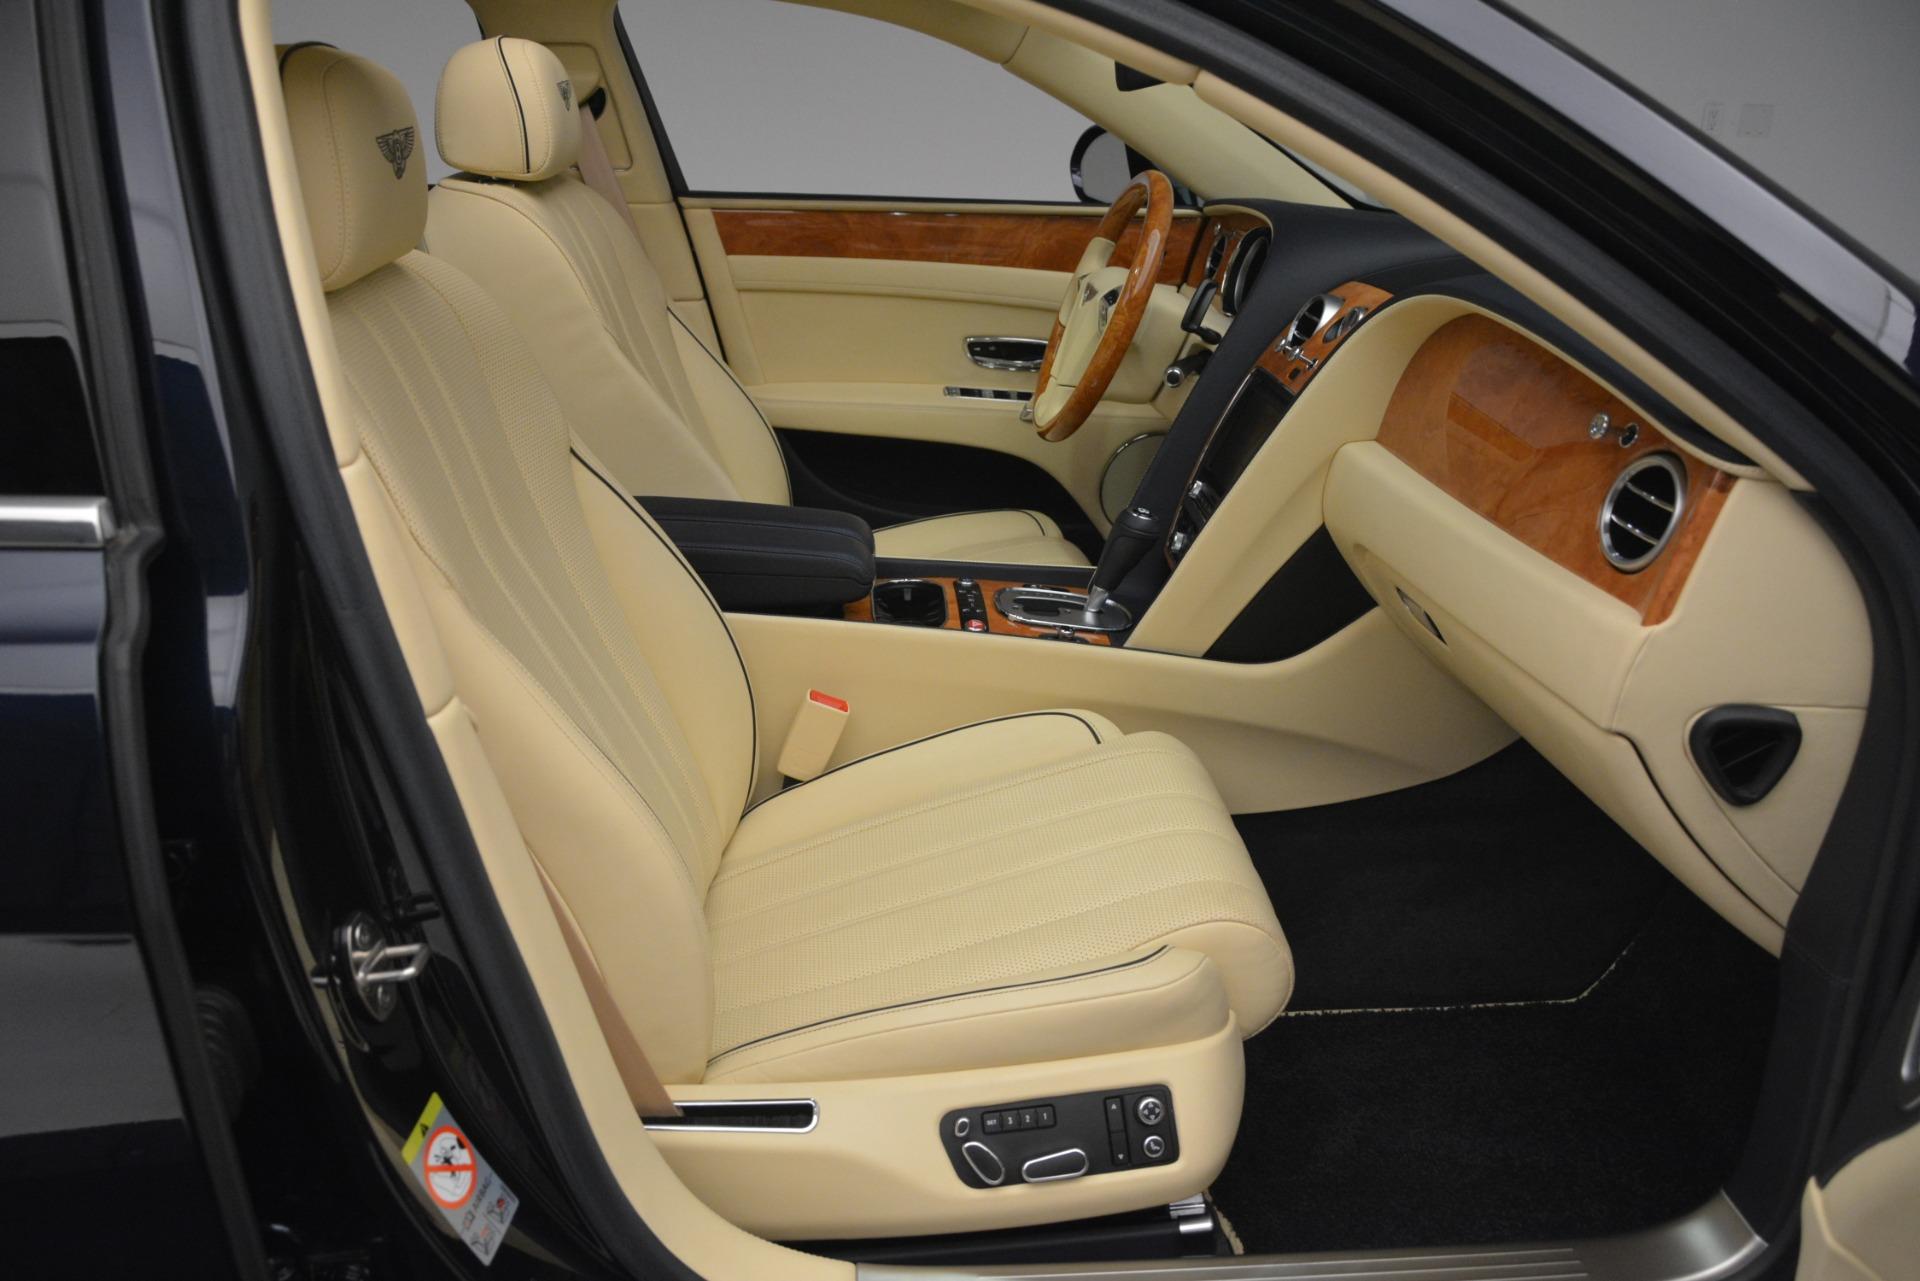 Used 2015 Bentley Flying Spur V8 For Sale In Westport, CT 2997_p30